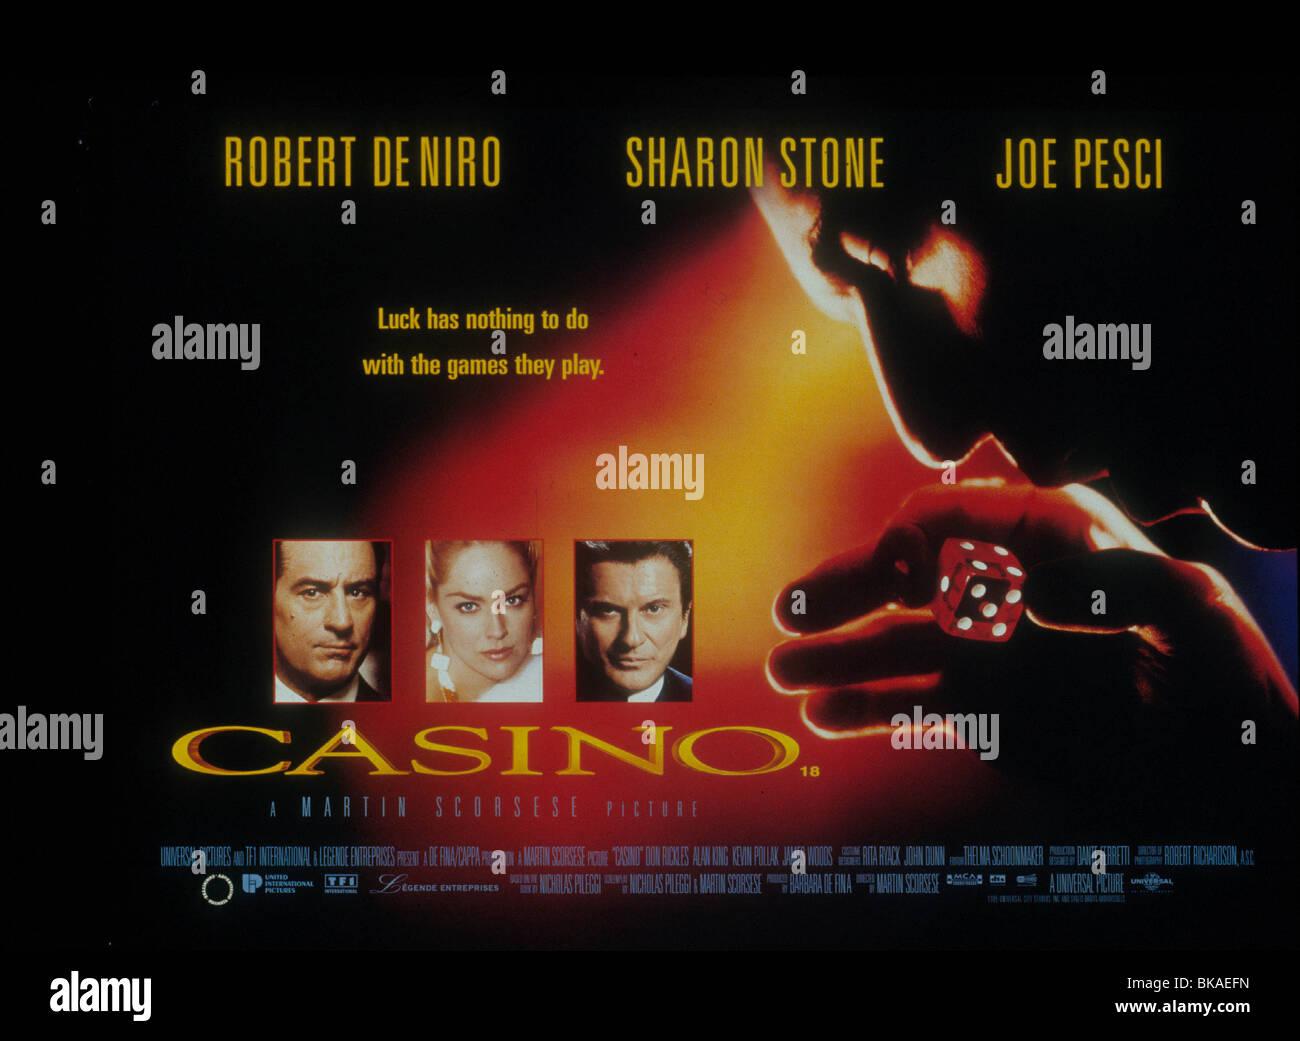 CASINO -1995 POSTER - Stock Image